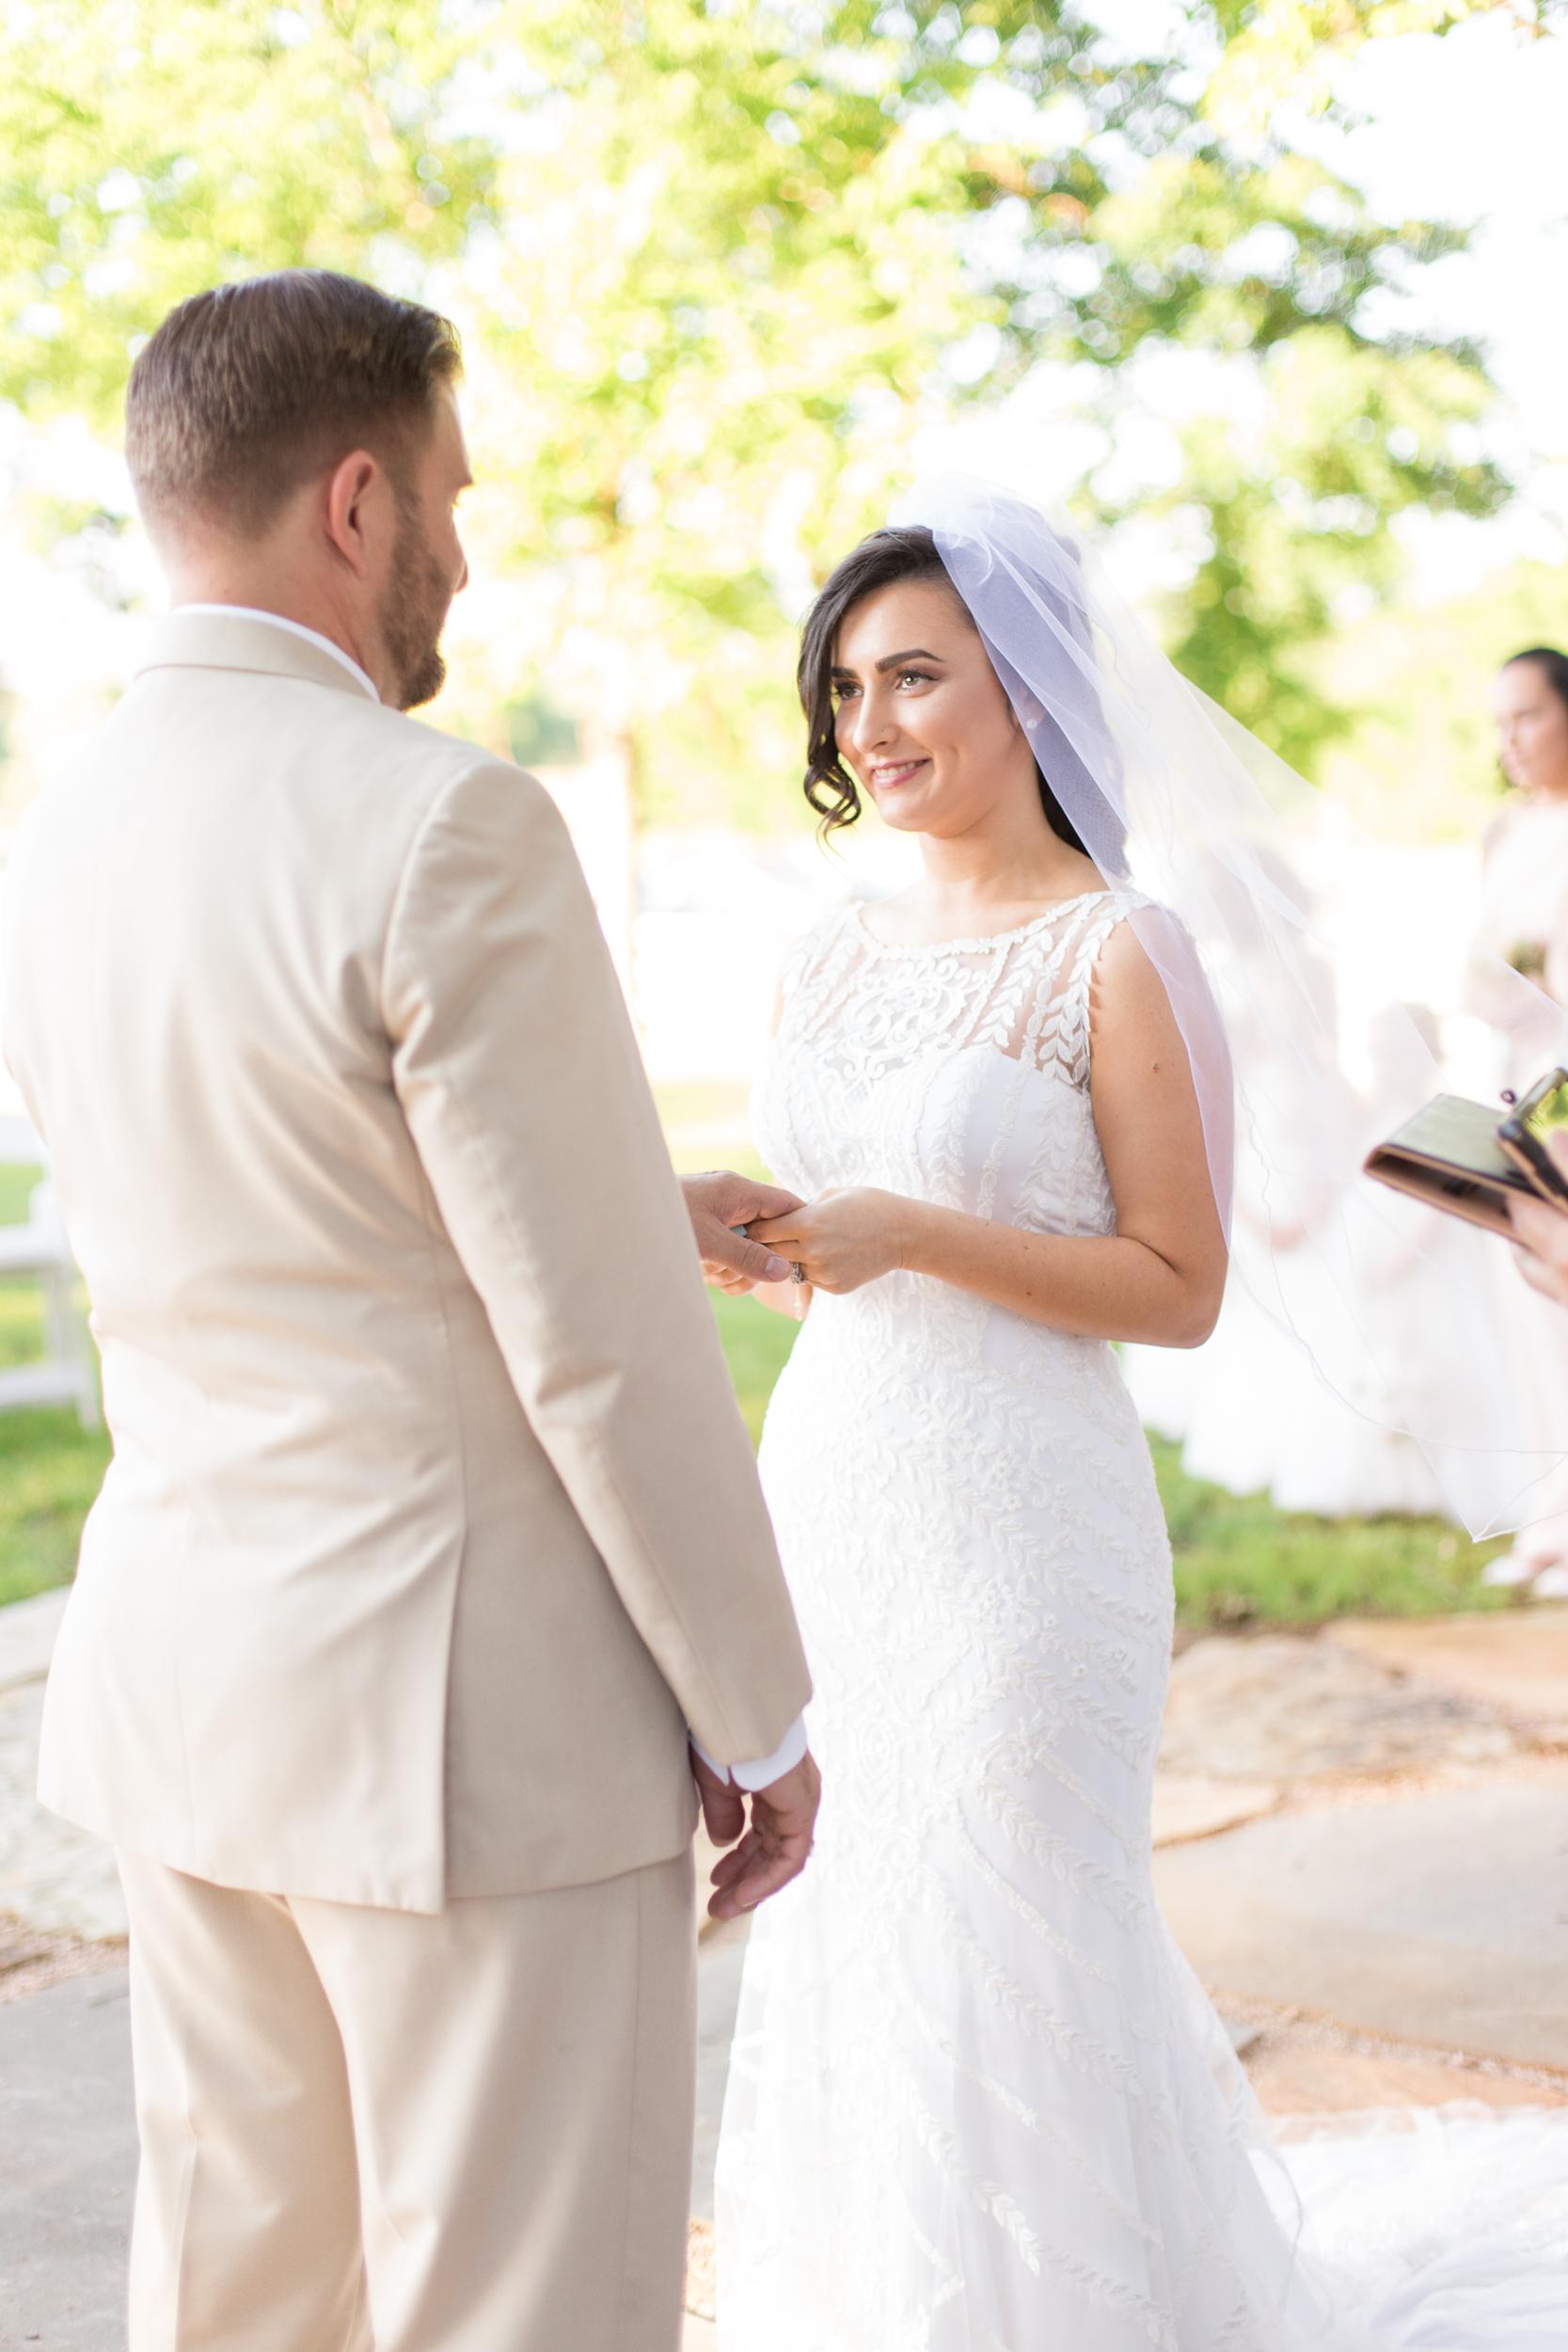 Zihlman-East TX Wedding_Kelsie Hendricks Photography_The Folmar Tyler Texas-108.jpg